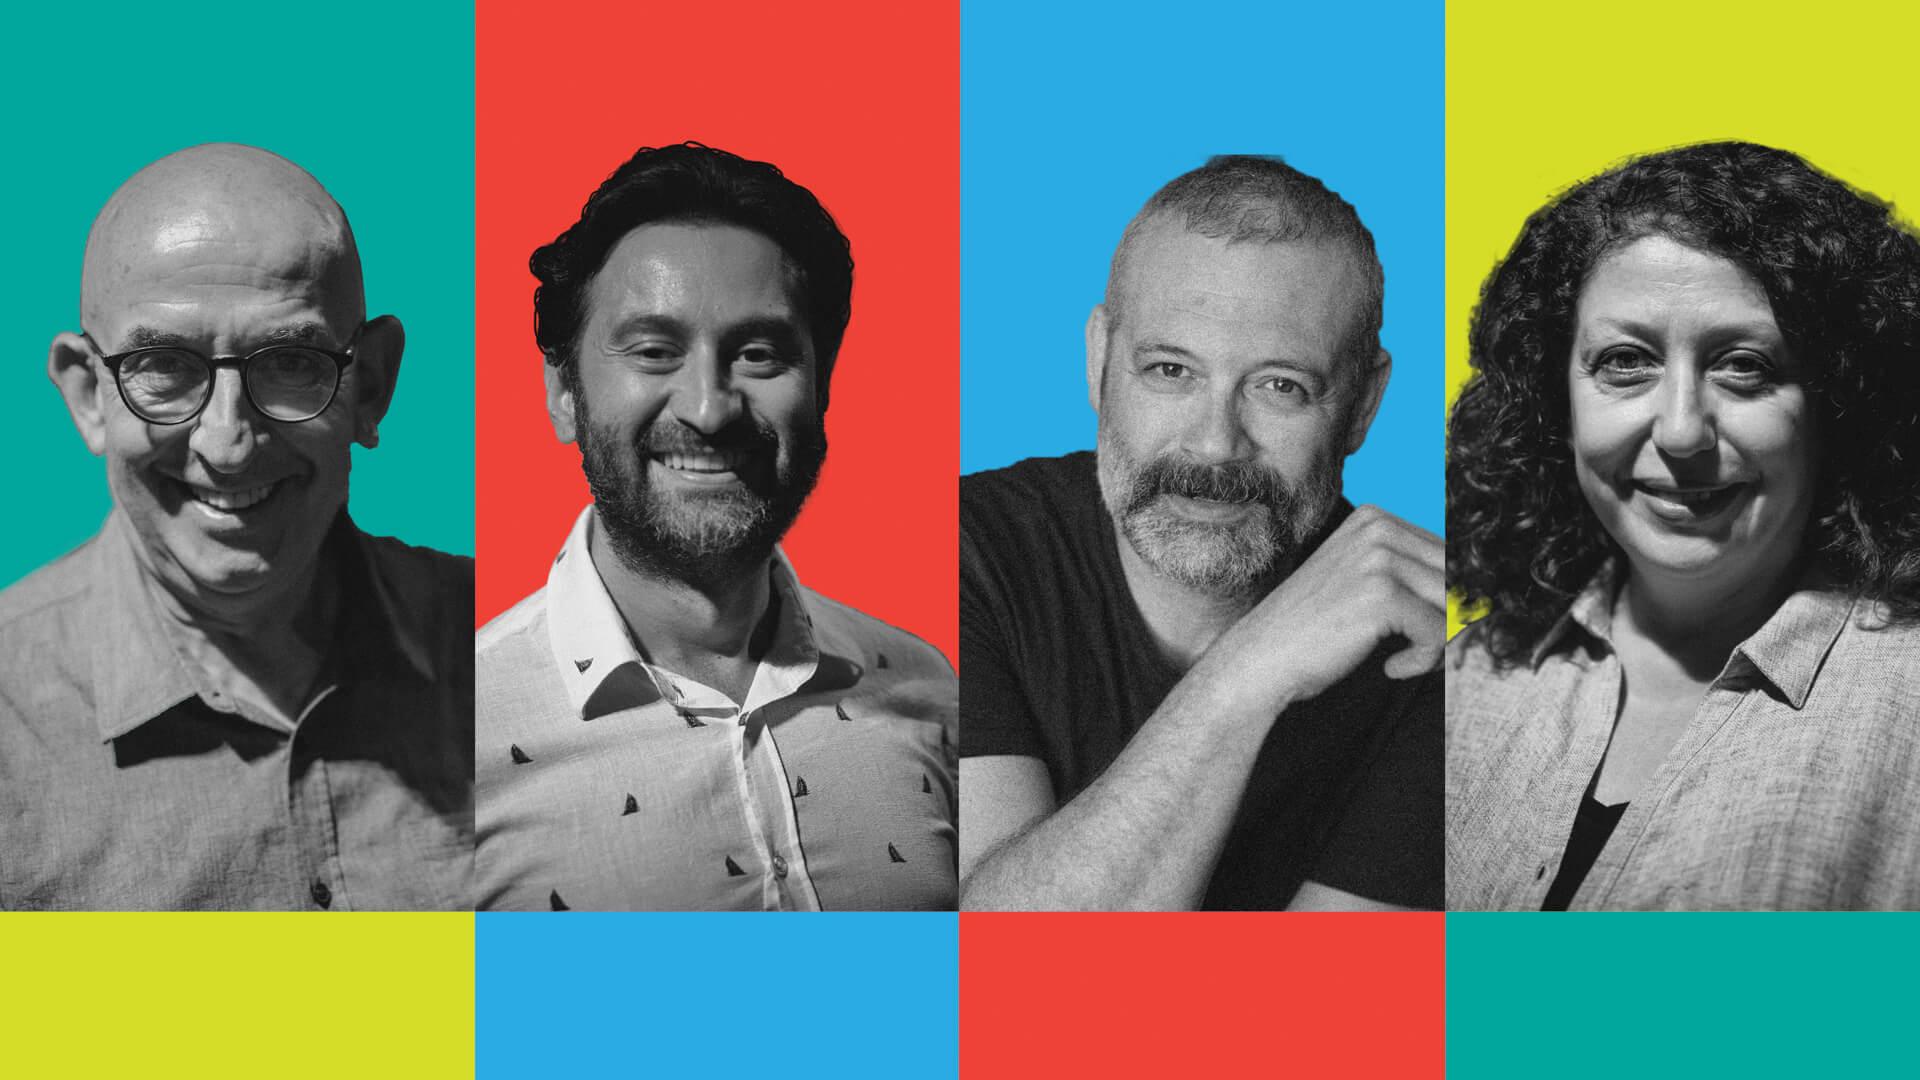 Intellectualism and Creativity in Acting <br> Metin Balay, Arda Öztürk, Levent Üzümcü, Fakiye Özsoysal